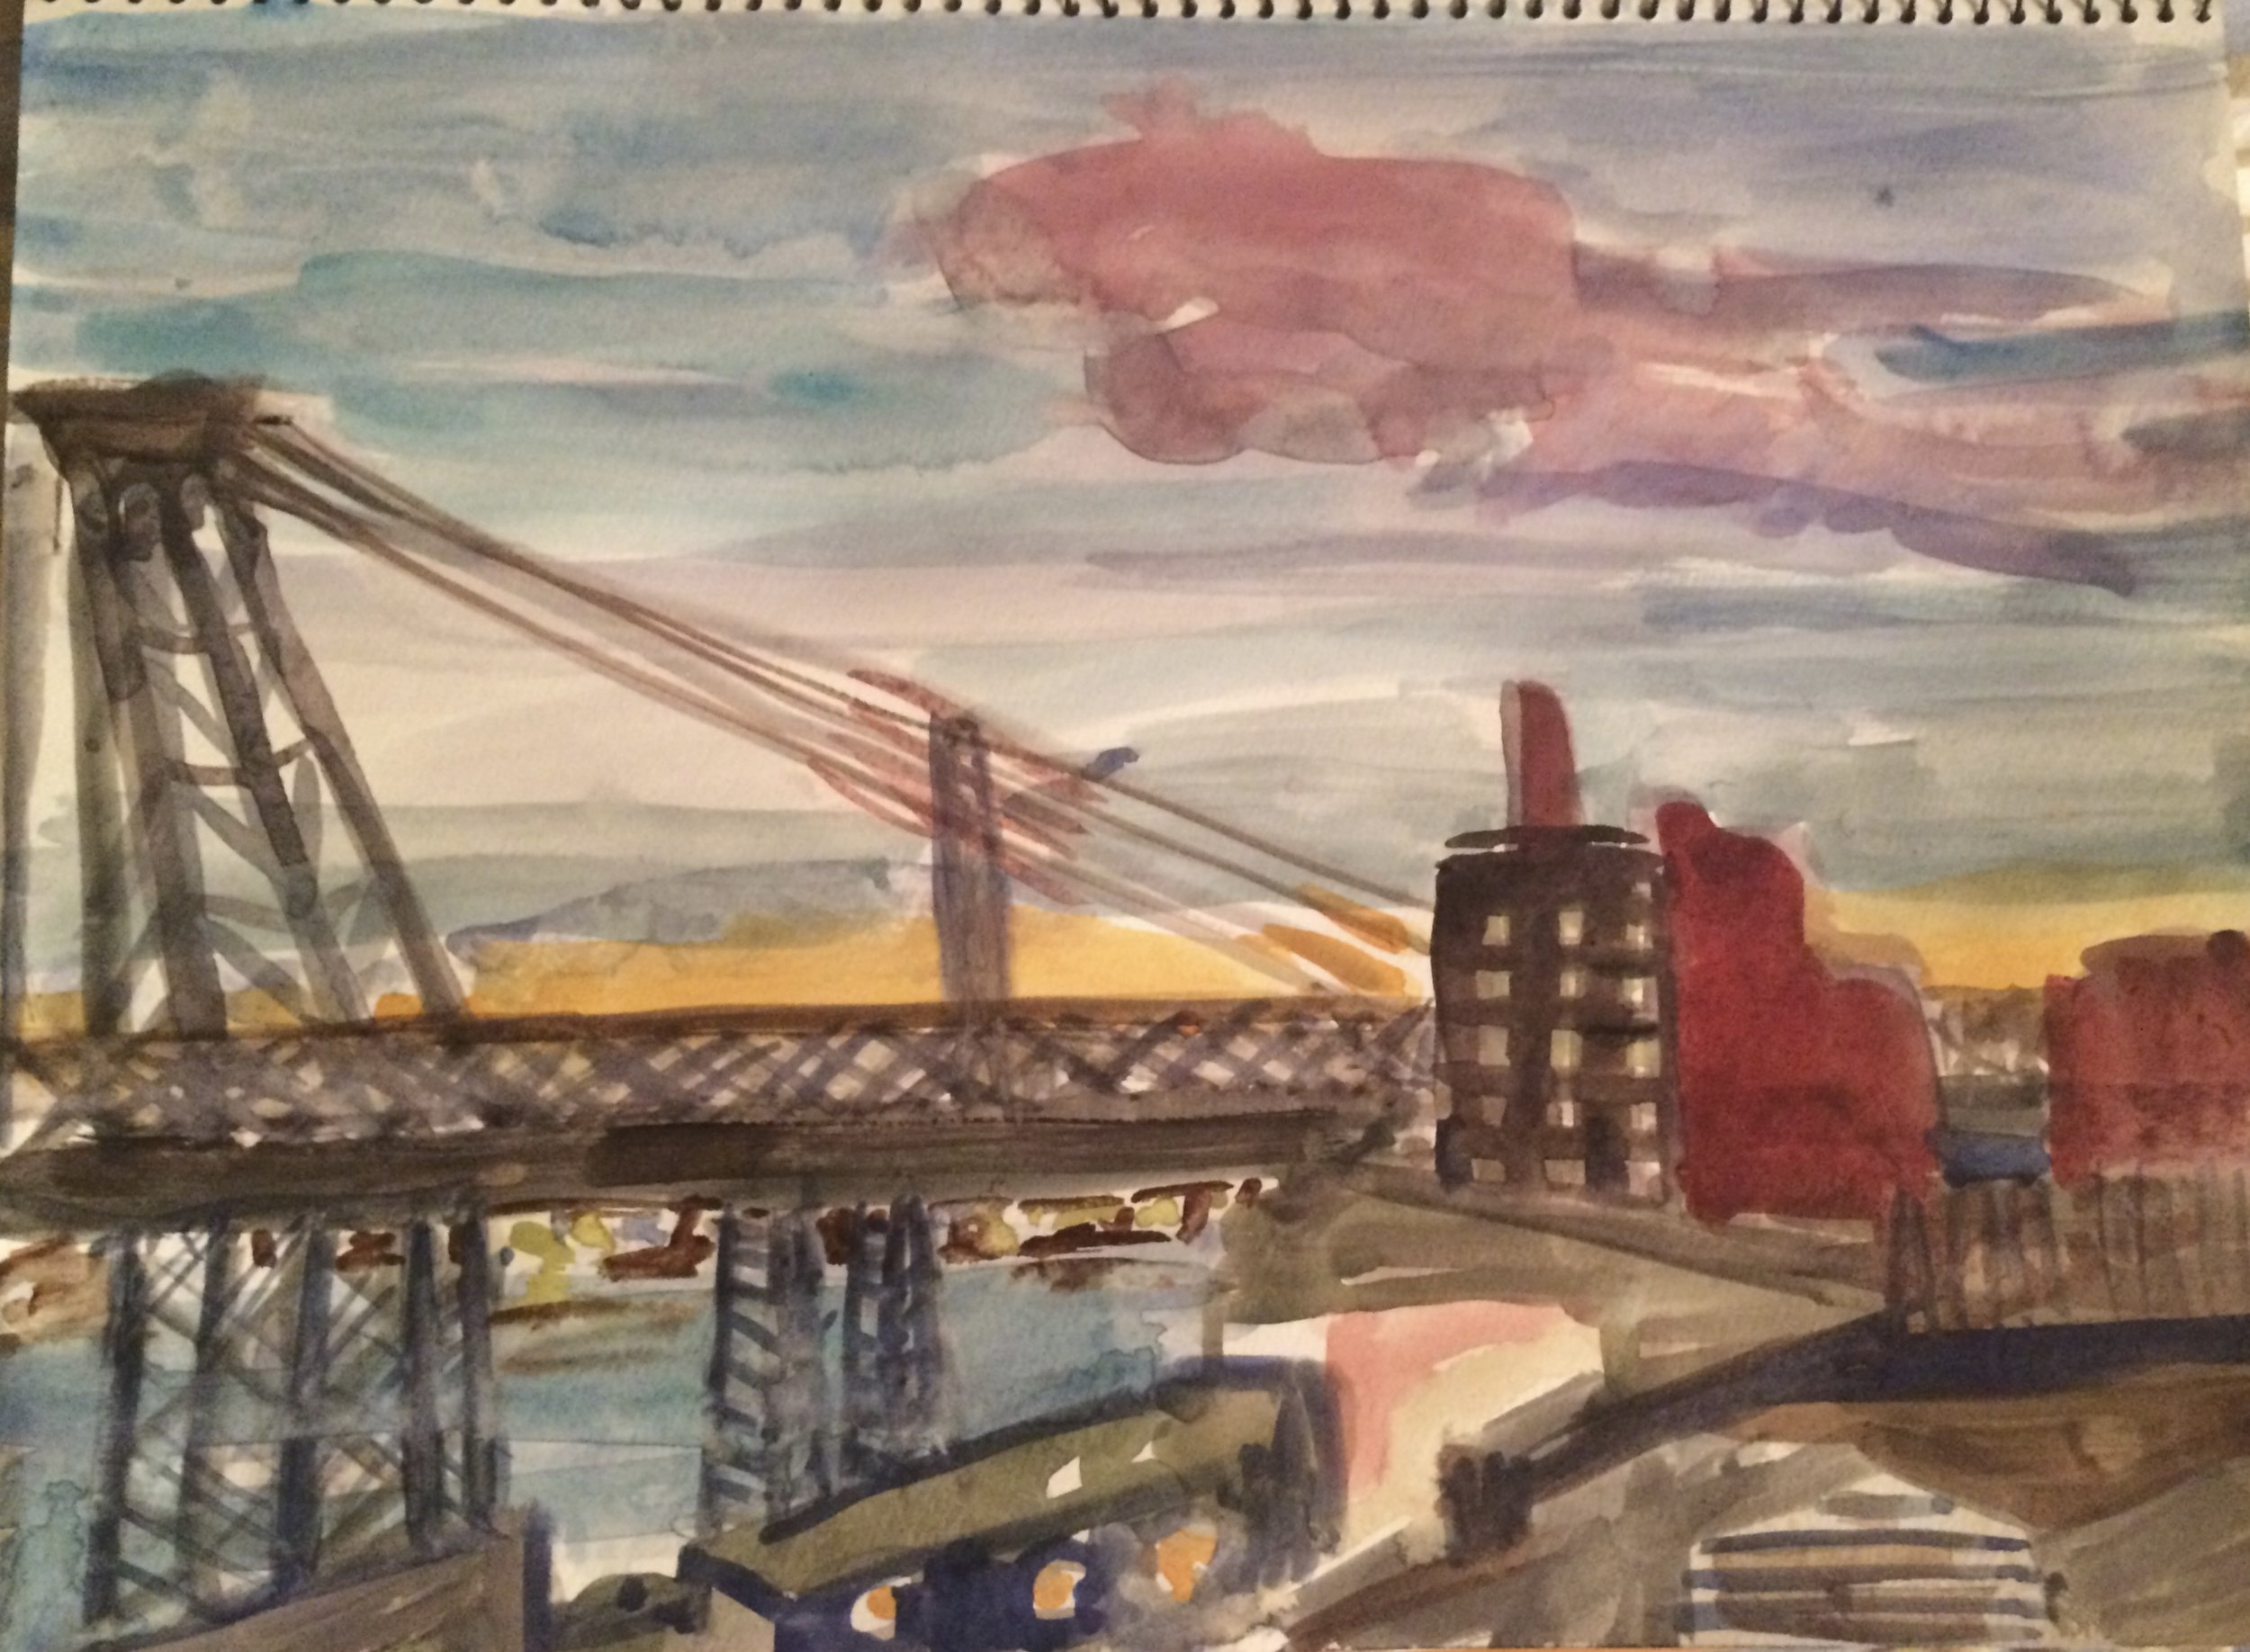 Williamsburg Bridge, Brooklyn 2015